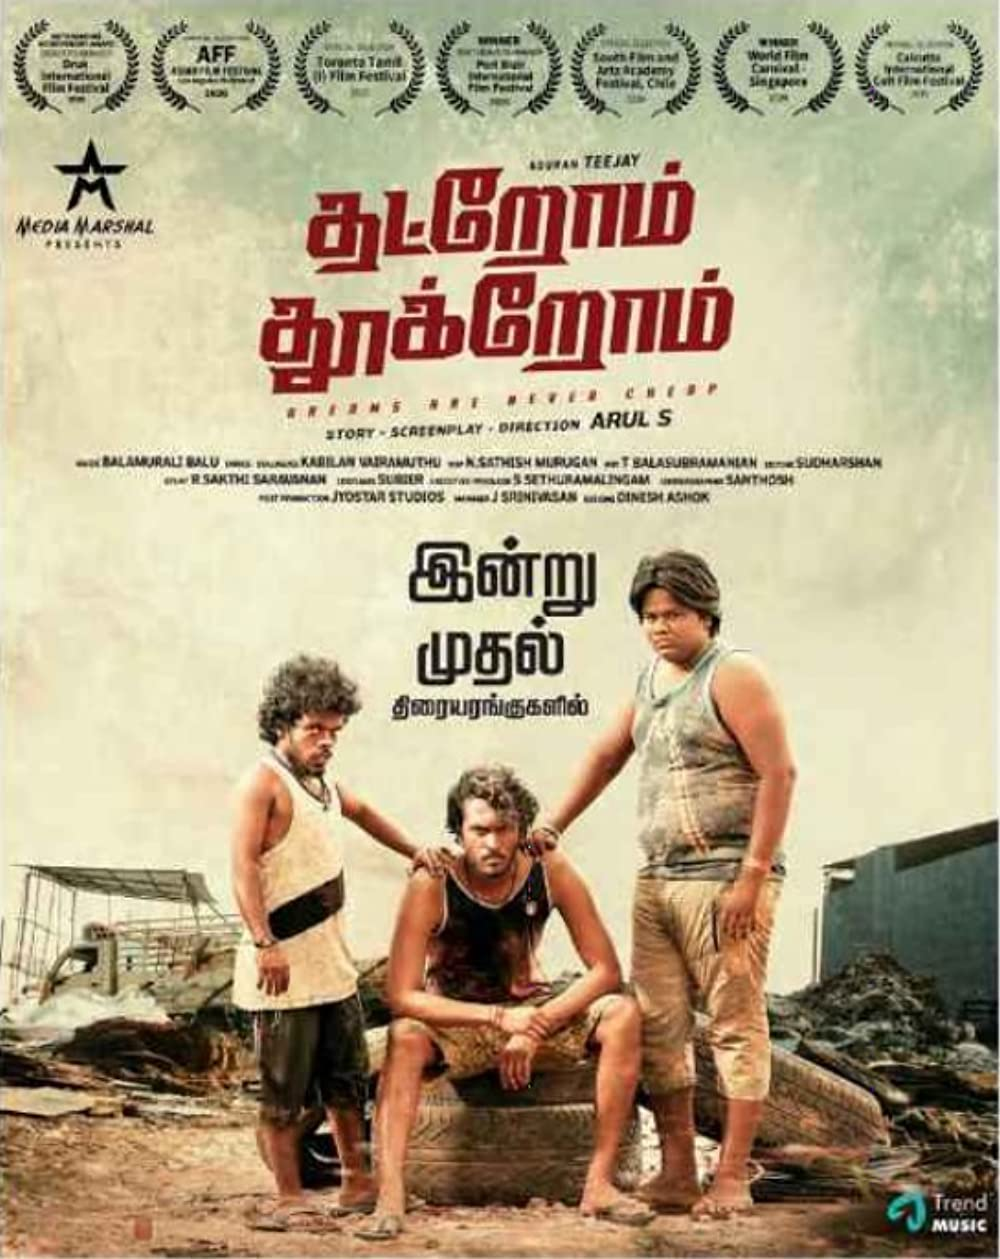 Thatrom Thookrom (2020) Tamil Full Movie 720p HDRip 500MB Download